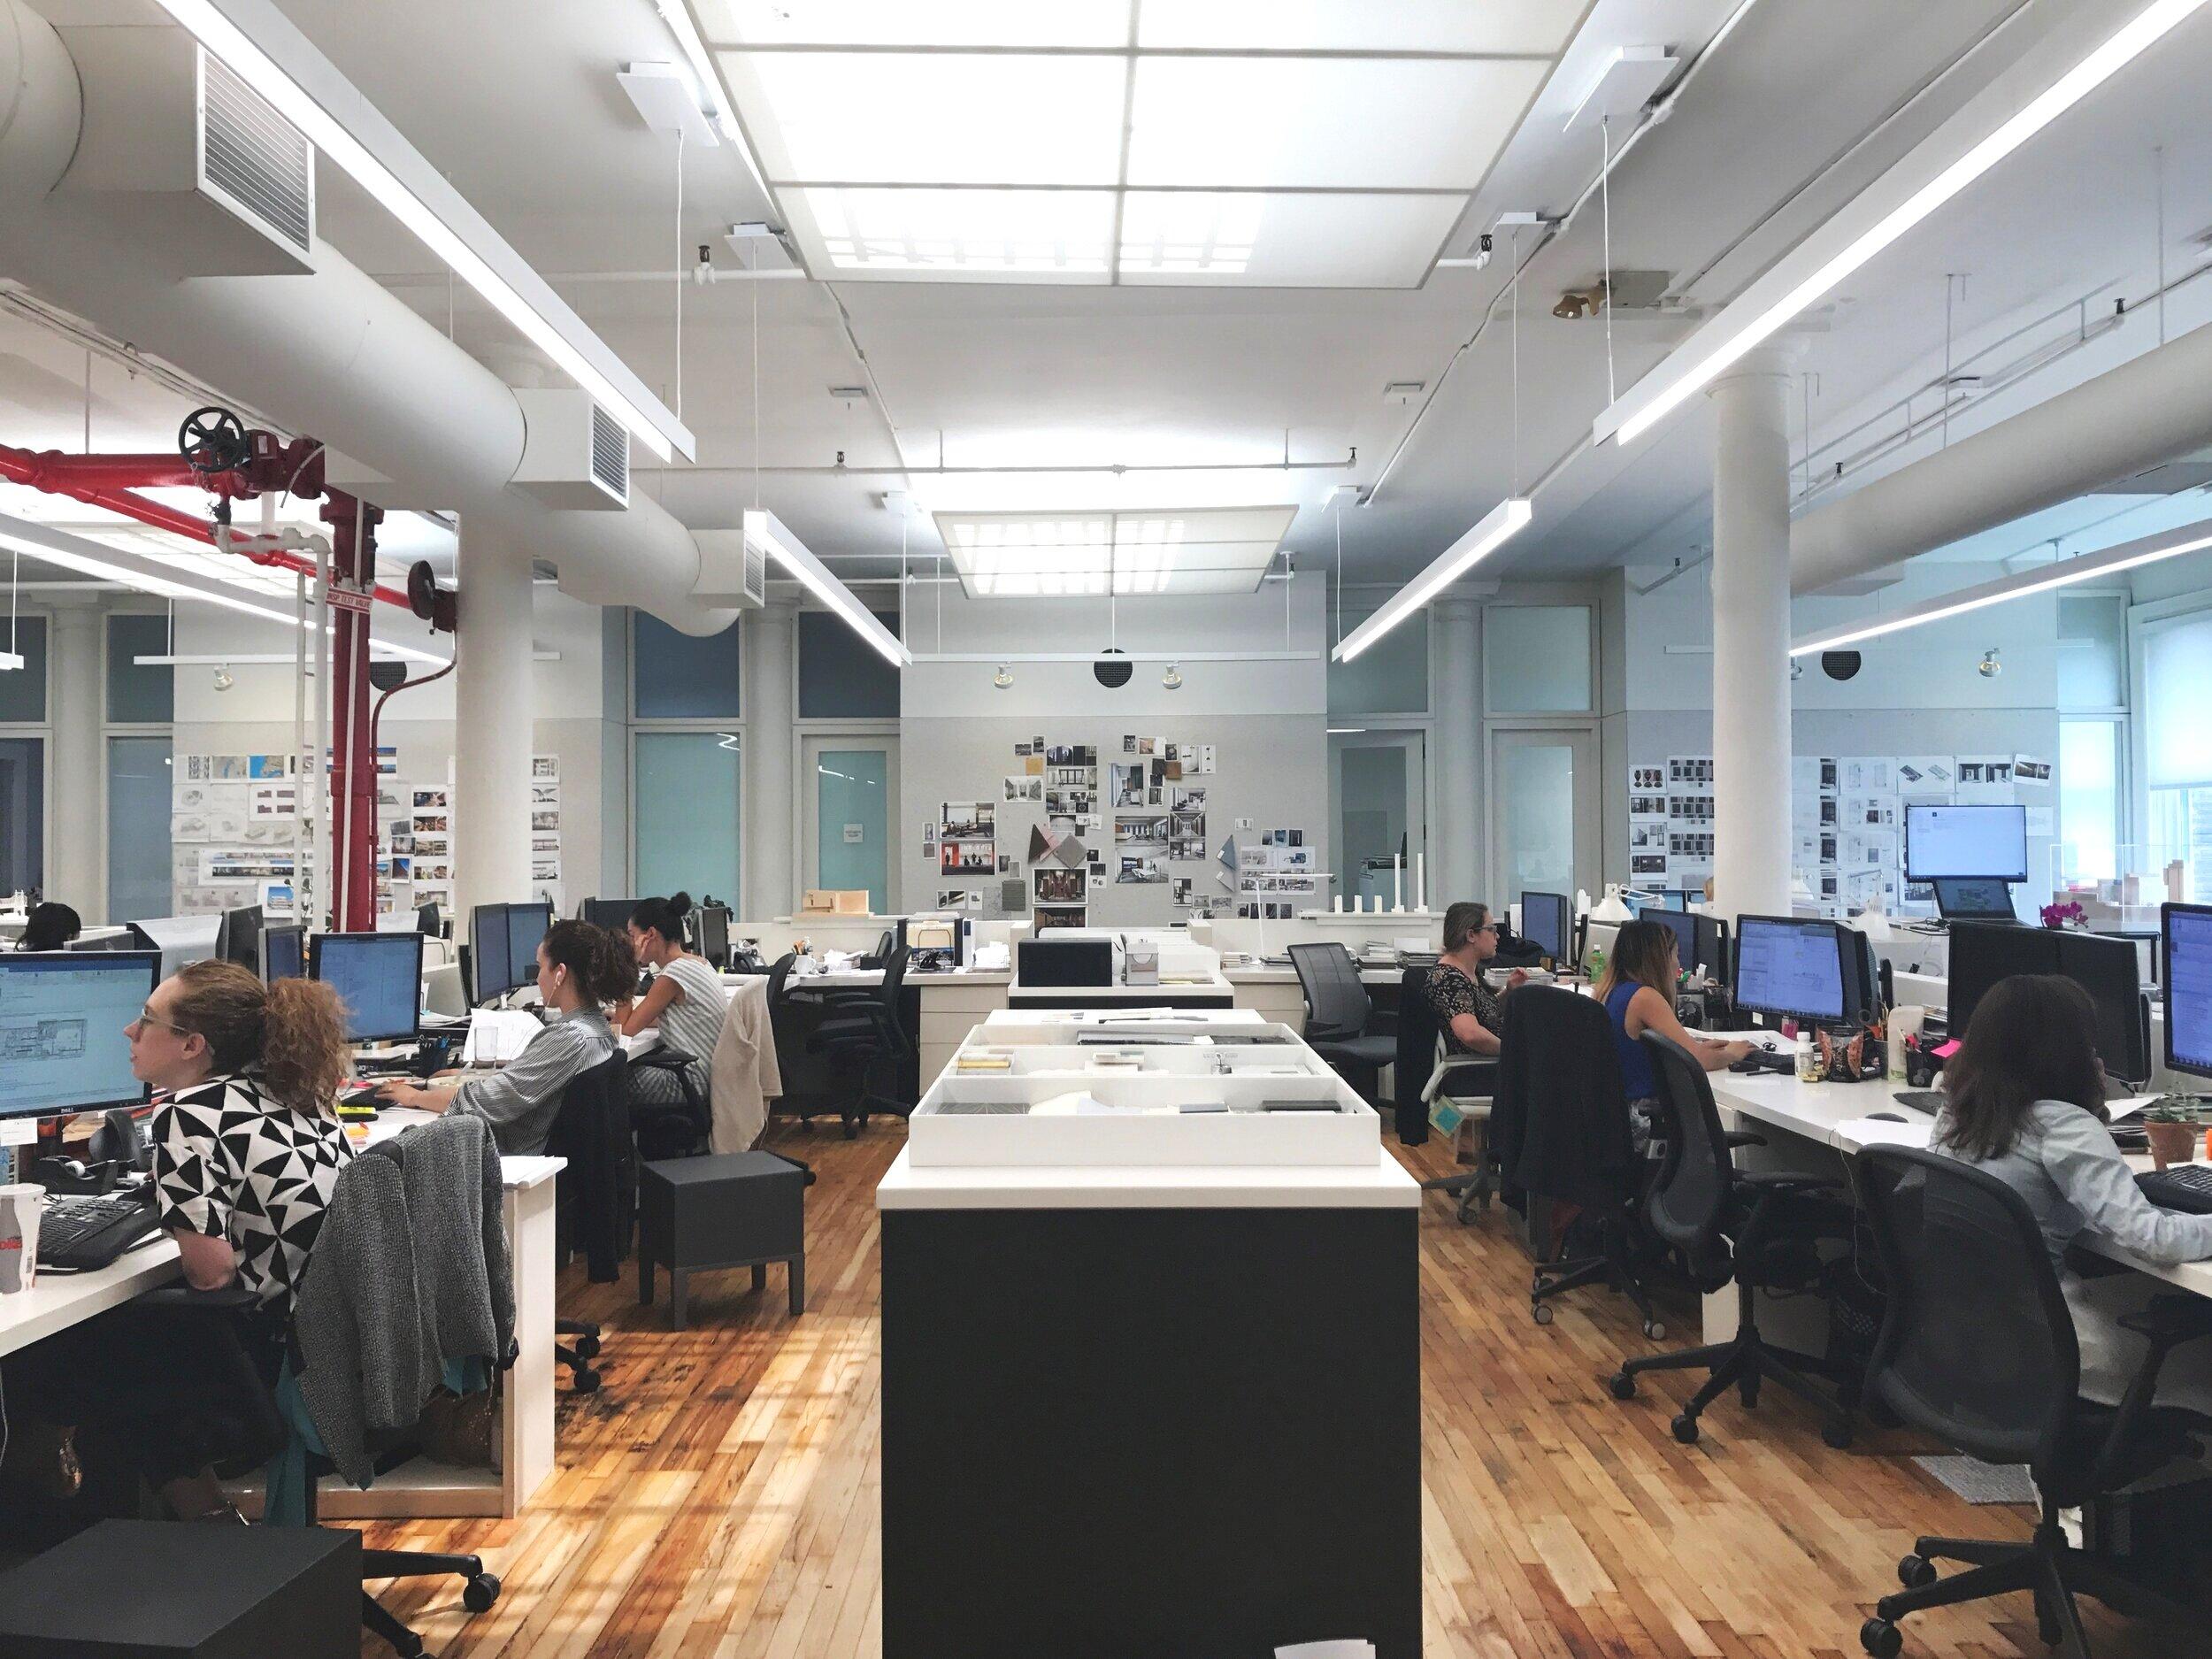 FXCollaborative's Interiors Studio